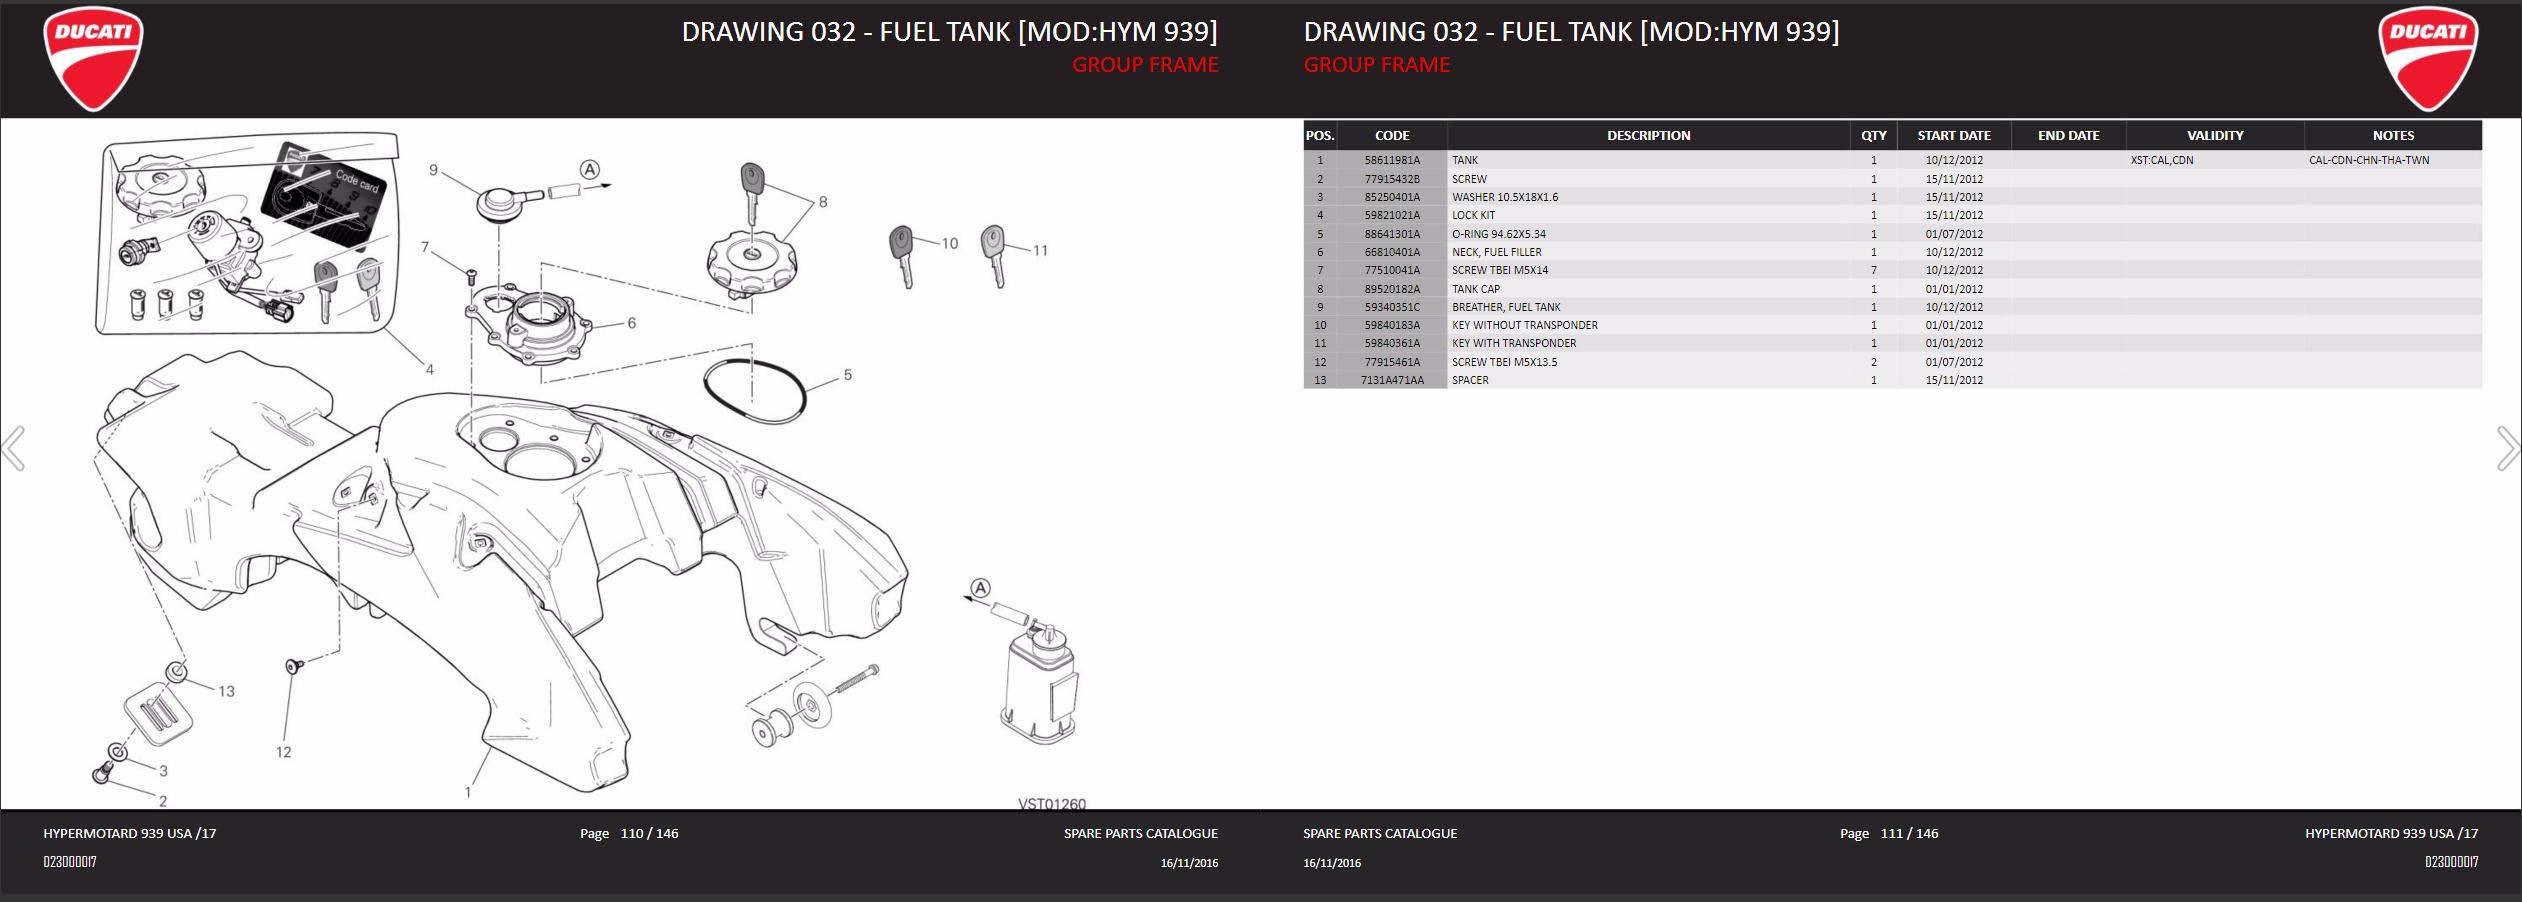 Ducati Fuel Filler oring HM HS 1100 939 796 SP 88641301A